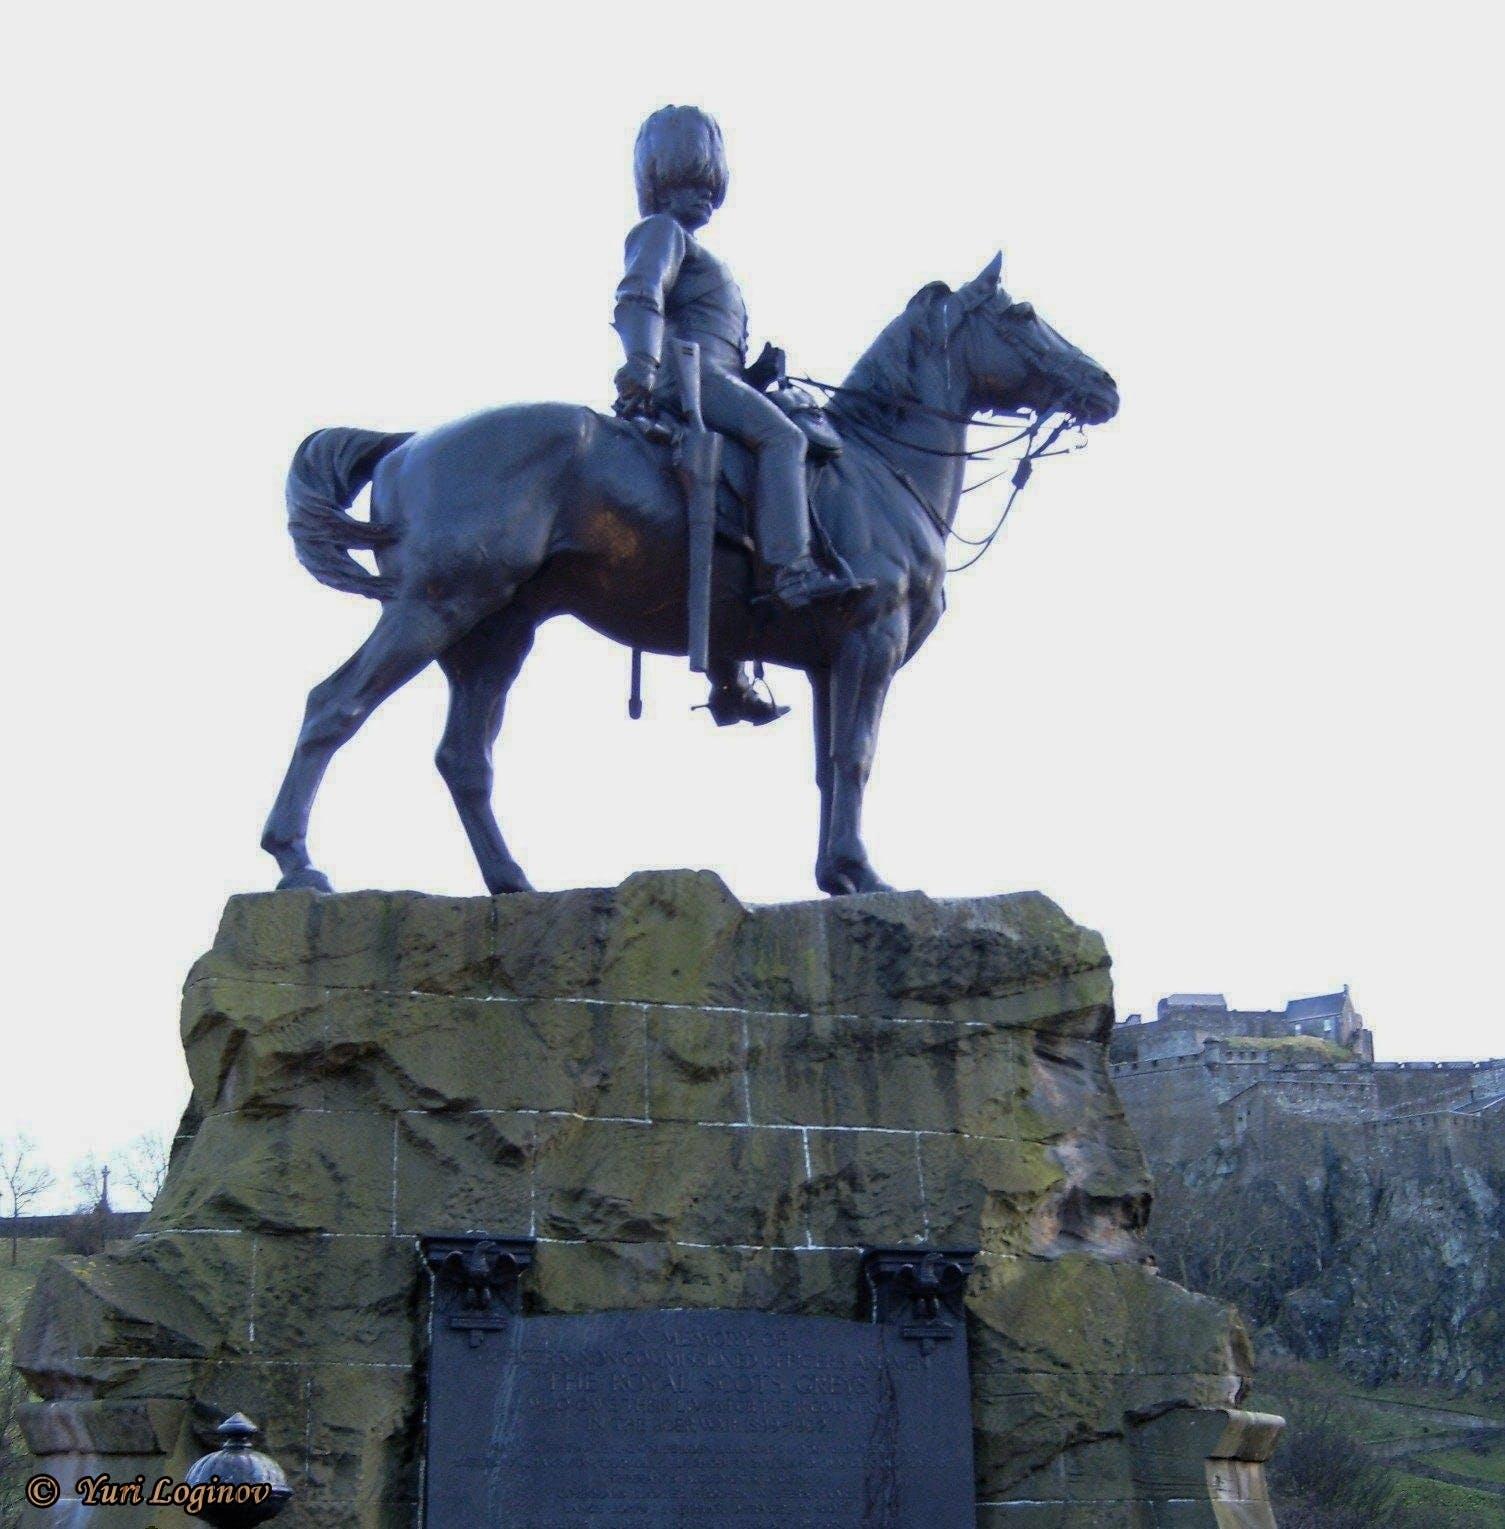 Free stock photo of scotland, edinburgh, united kingdom, The Royal Scots Greys monument